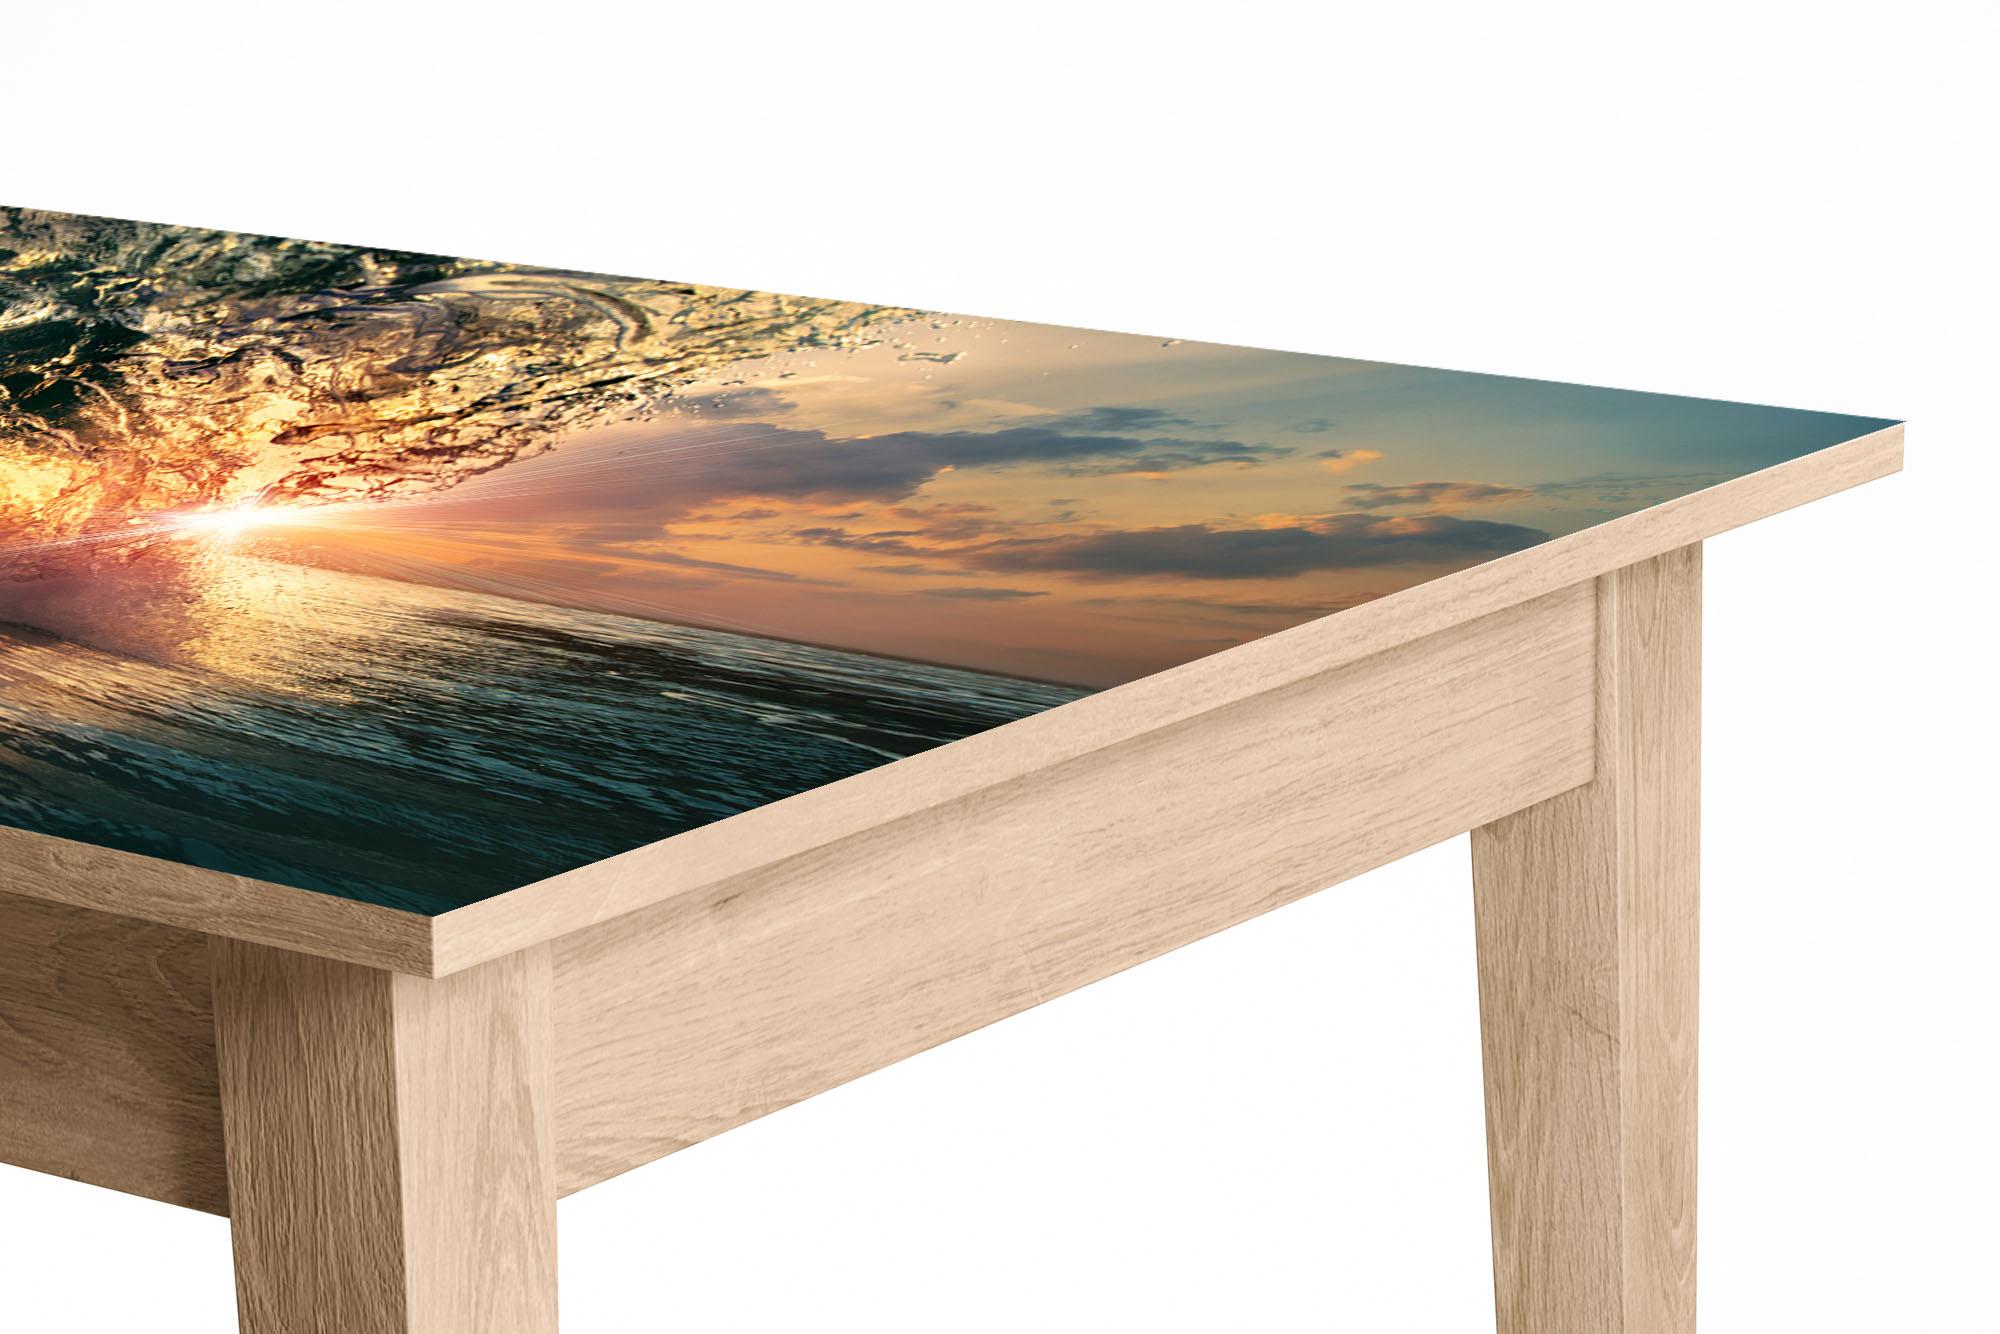 Ocean Wave in the Sun Laminated Self Adhesive Vinyl Table Desk Art Décor Cover